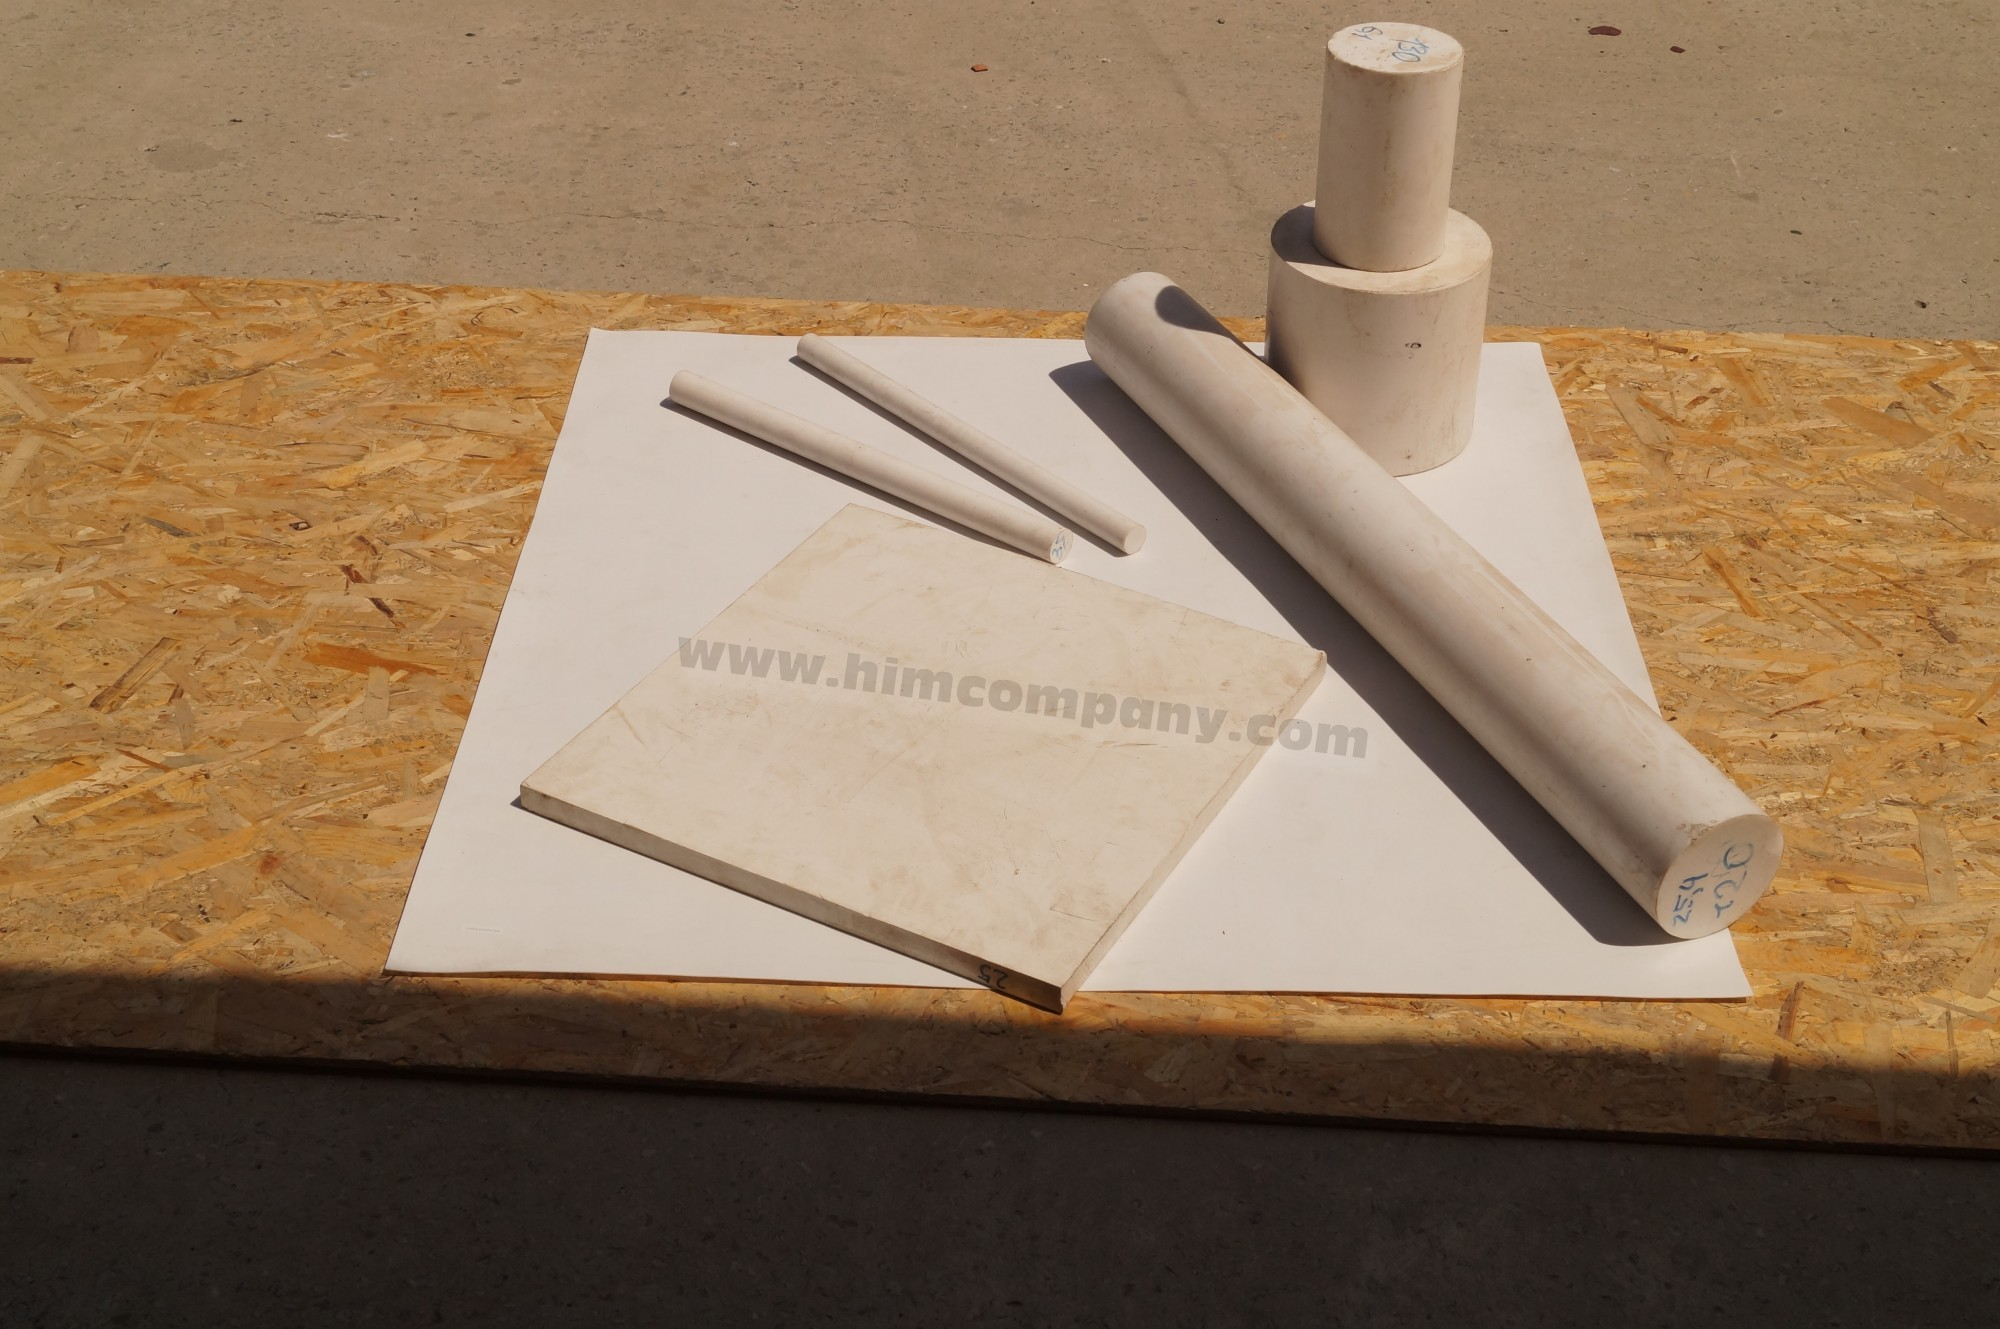 Фторопласт листовой 15 мм (1000х1000 мм, вес~32 кг.)